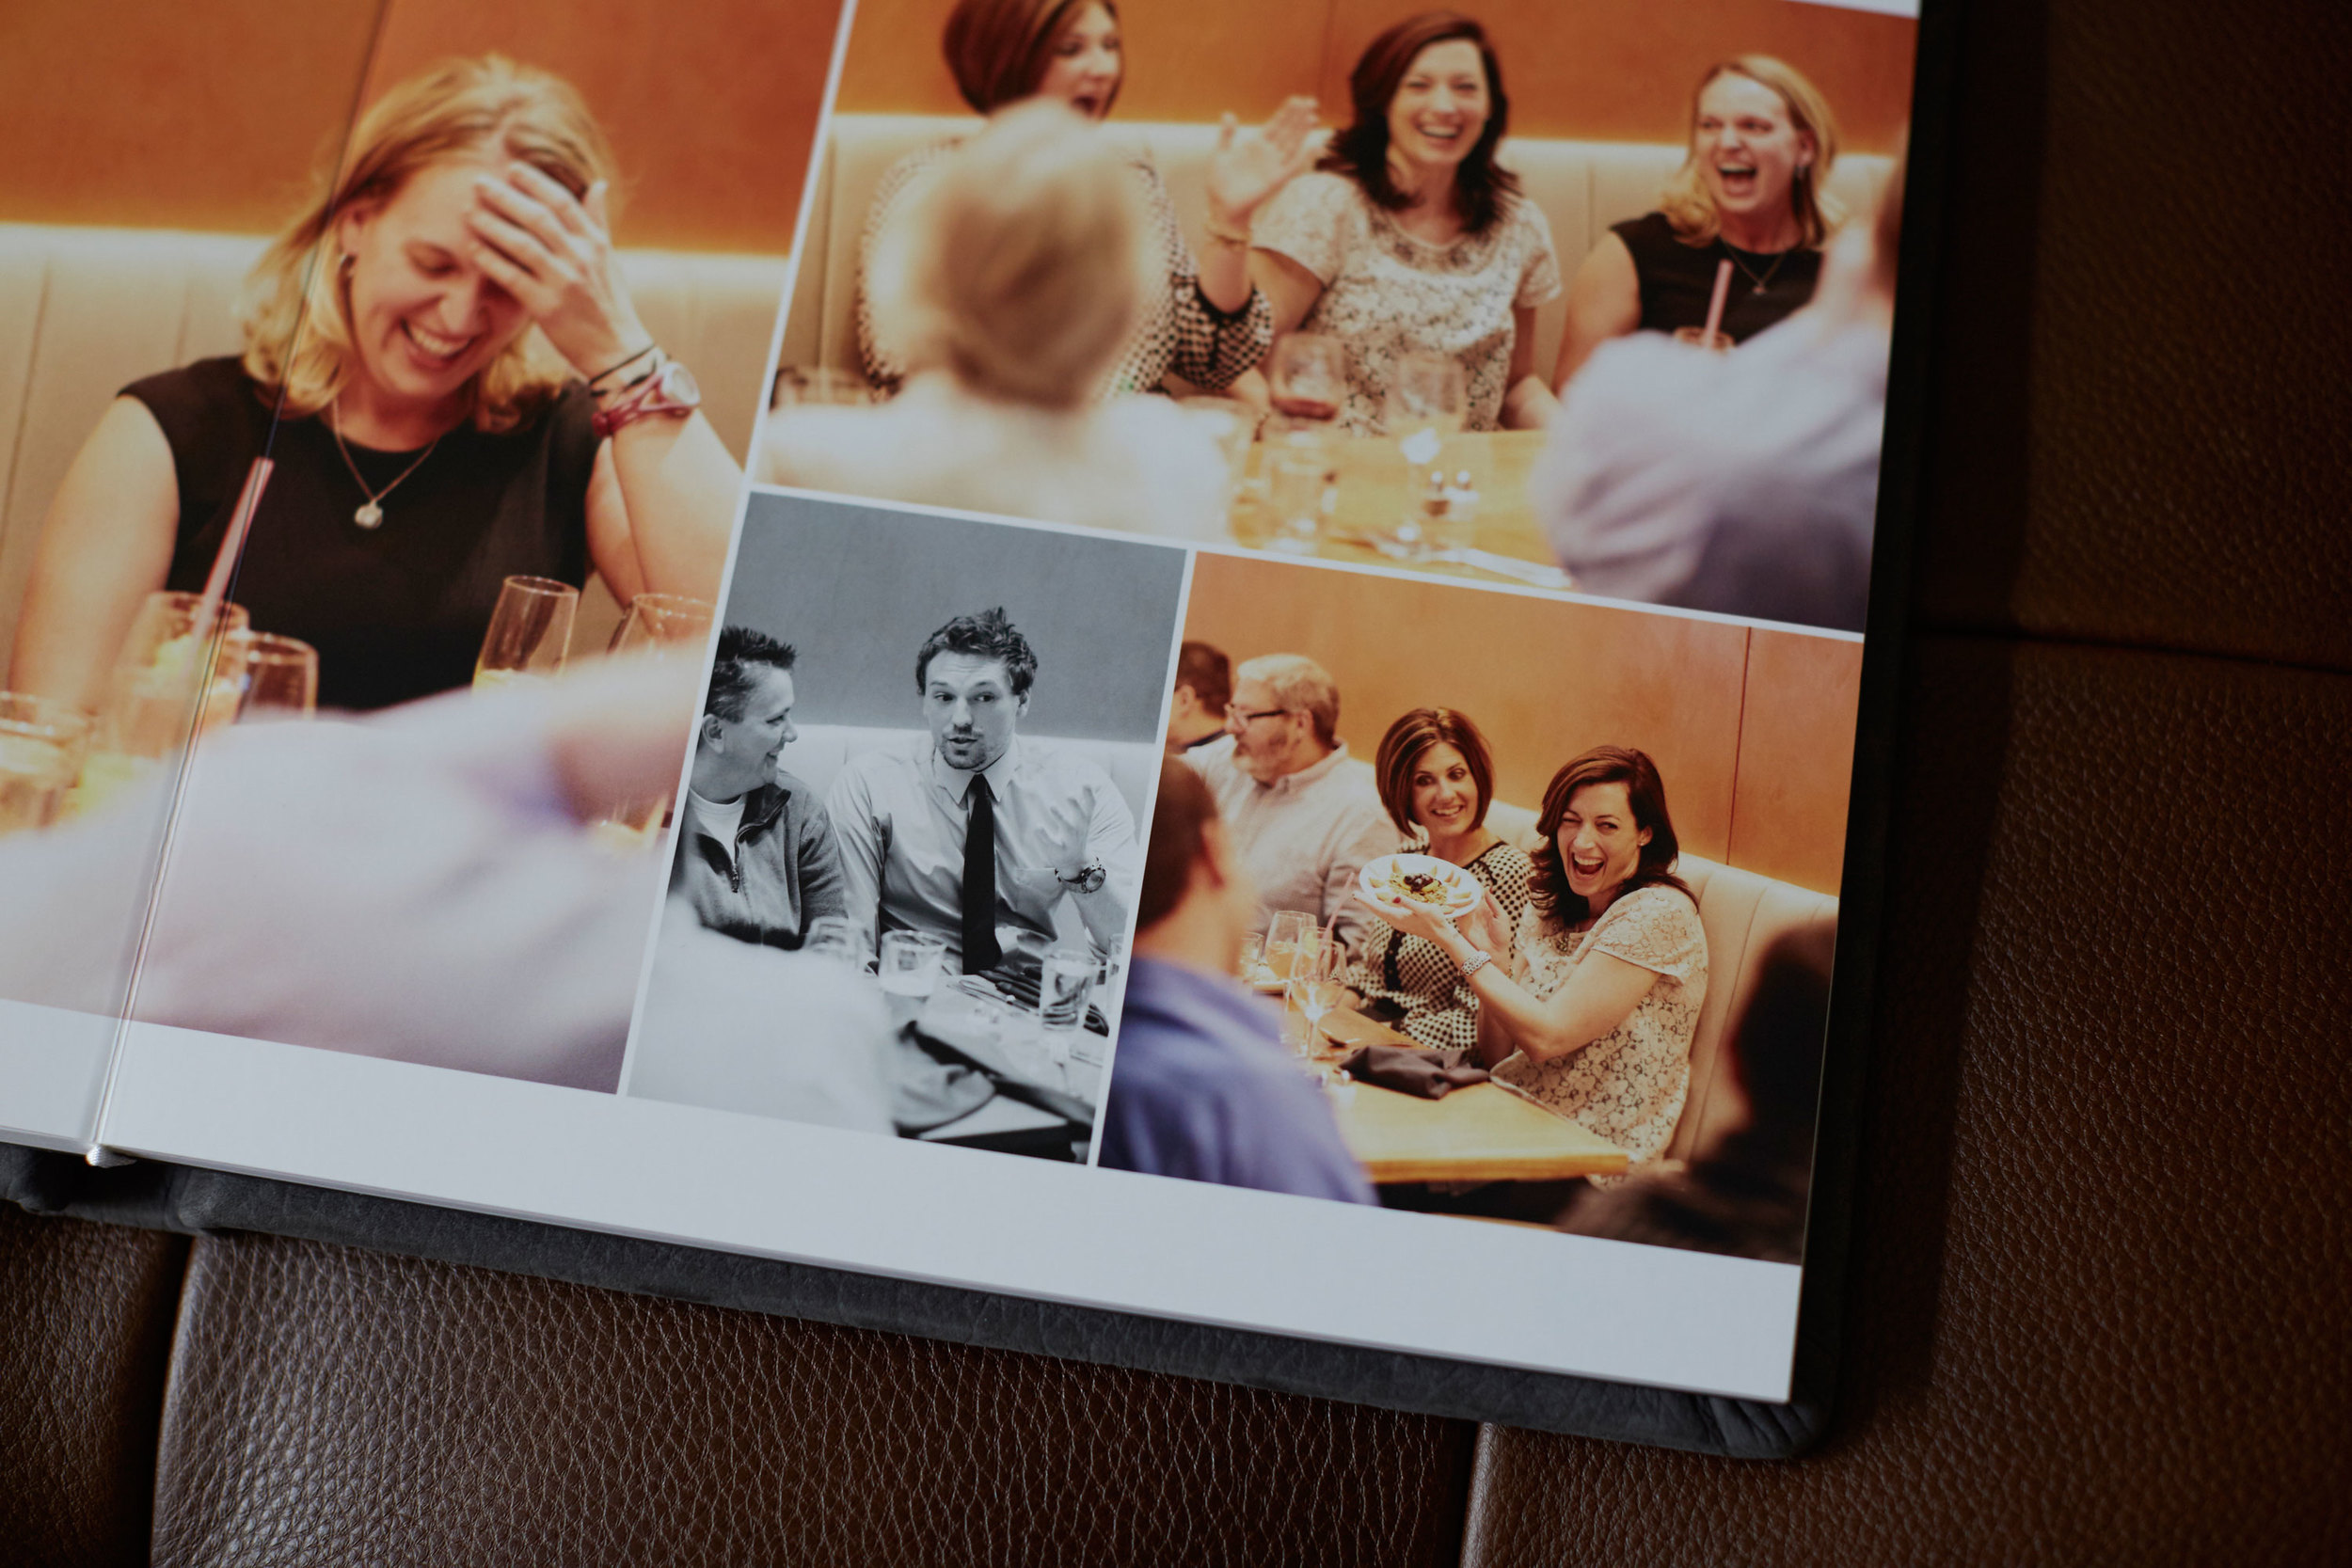 nickfayweddings-albums-small-006.jpg